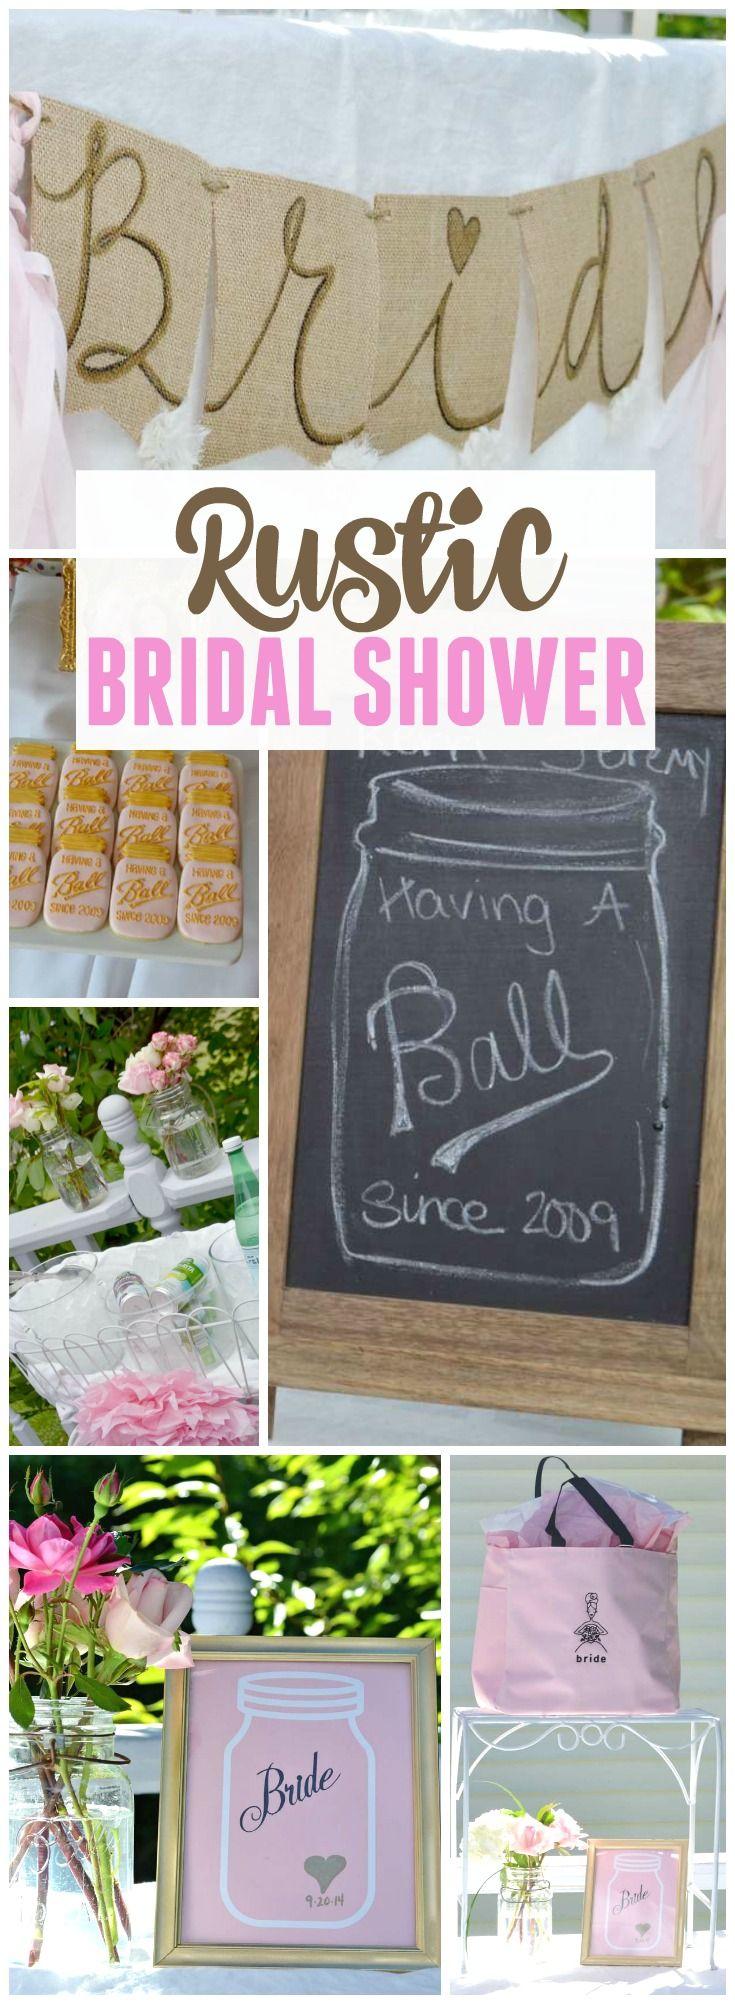 17 best ideas about bridal shower rustic on pinterest. Black Bedroom Furniture Sets. Home Design Ideas